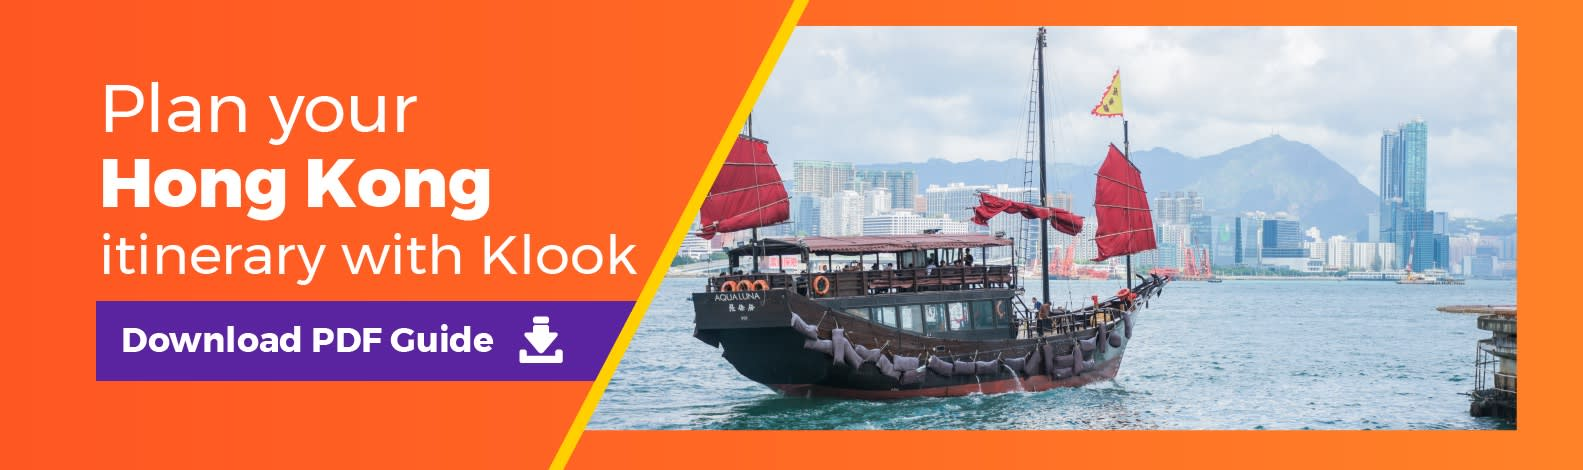 PH] 4D3N Hong Kong Itinerary - Klook Event